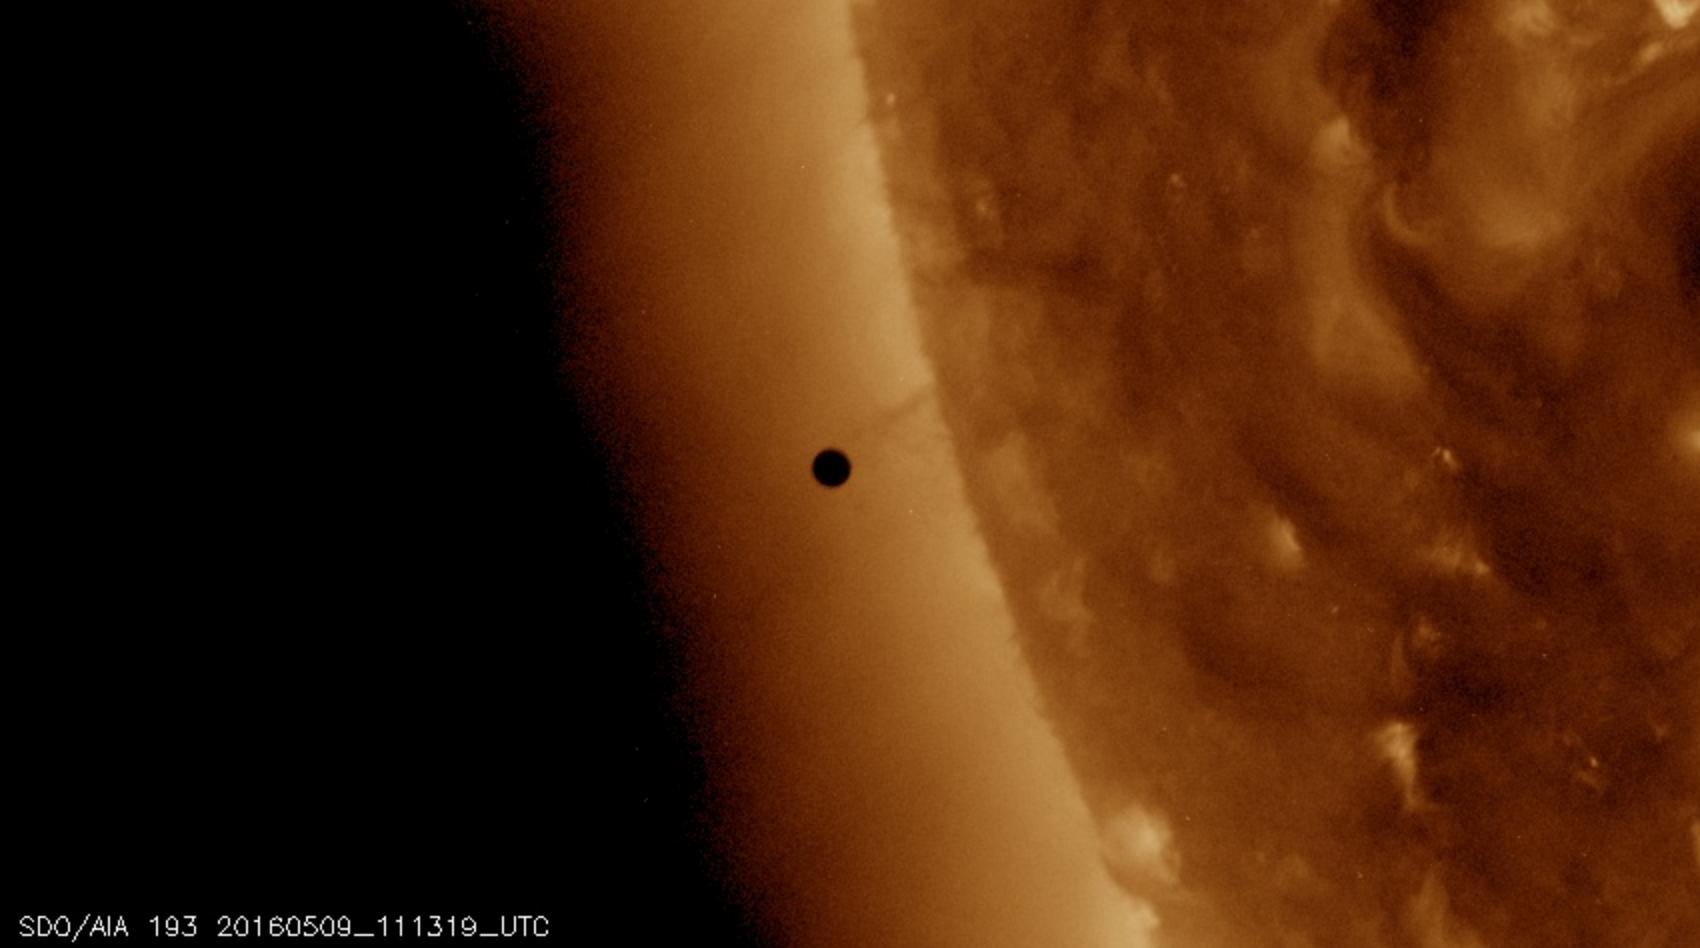 Photo: Mercury's transit about to begin. Data courtesy of NASA/SDO, HMI, and AIA science teams.